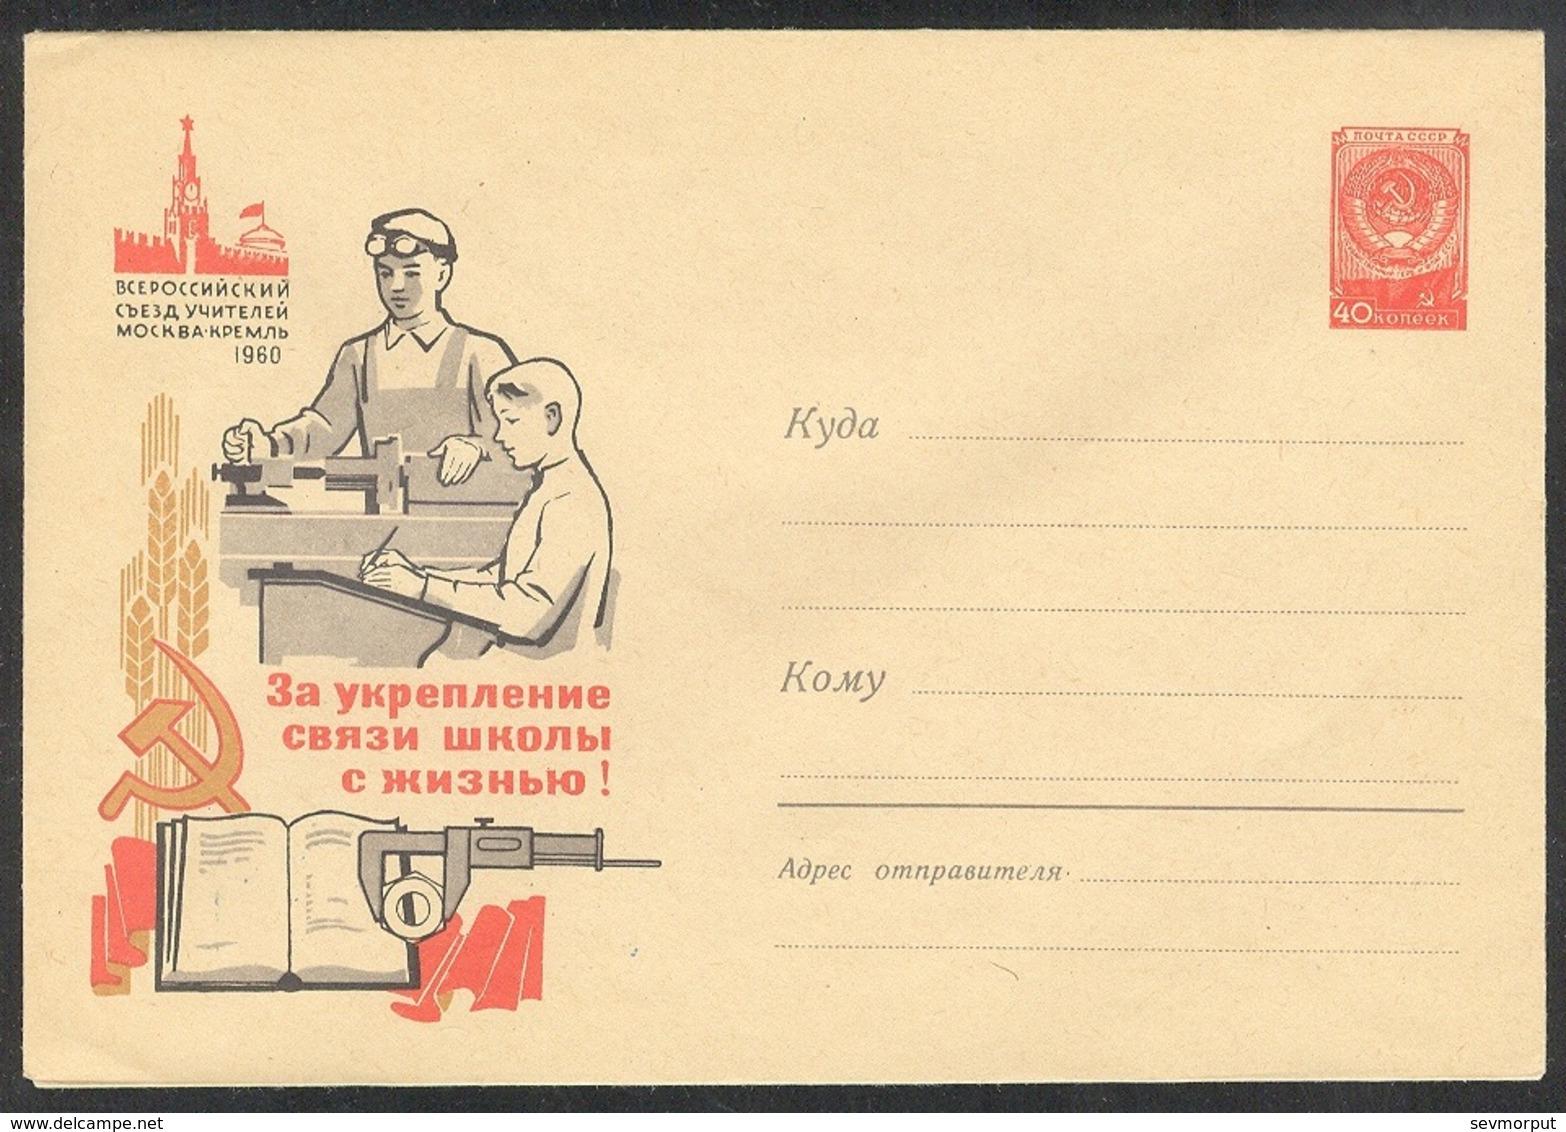 1239 RUSSIA 1960 COVER Mint TEACHER CONGRESS CHILD CHILDREN ENFANT SCHOOL ECOLE ECOLIER EDUCATION JOB WORK USSR 143 - Berufe